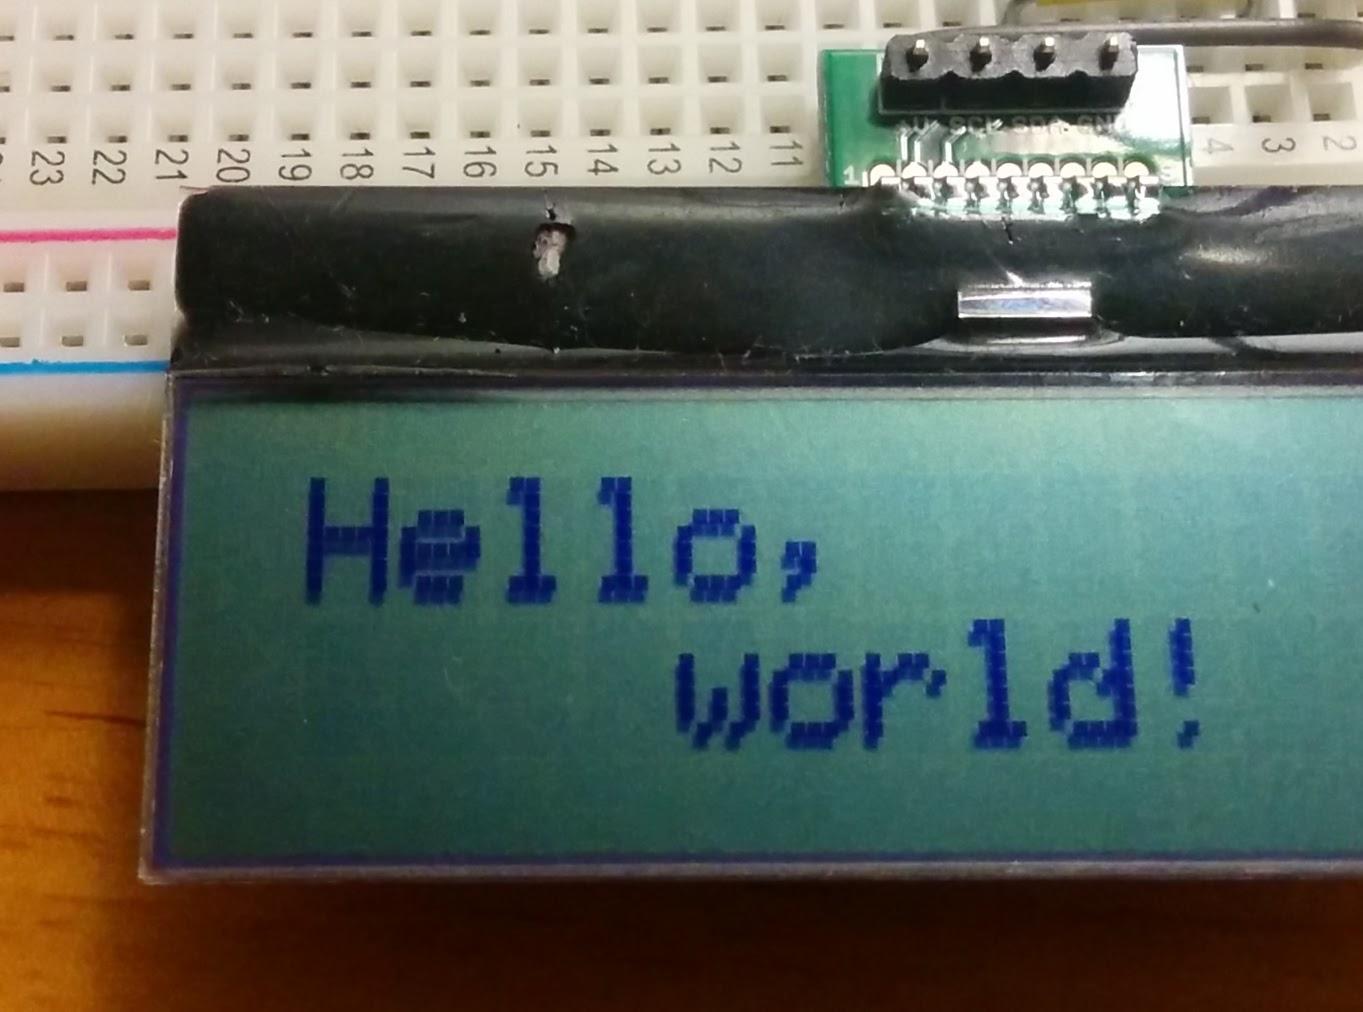 Raspberry Pilcdaqm1602ip Wiringpi I2c Lcd Oledarduino